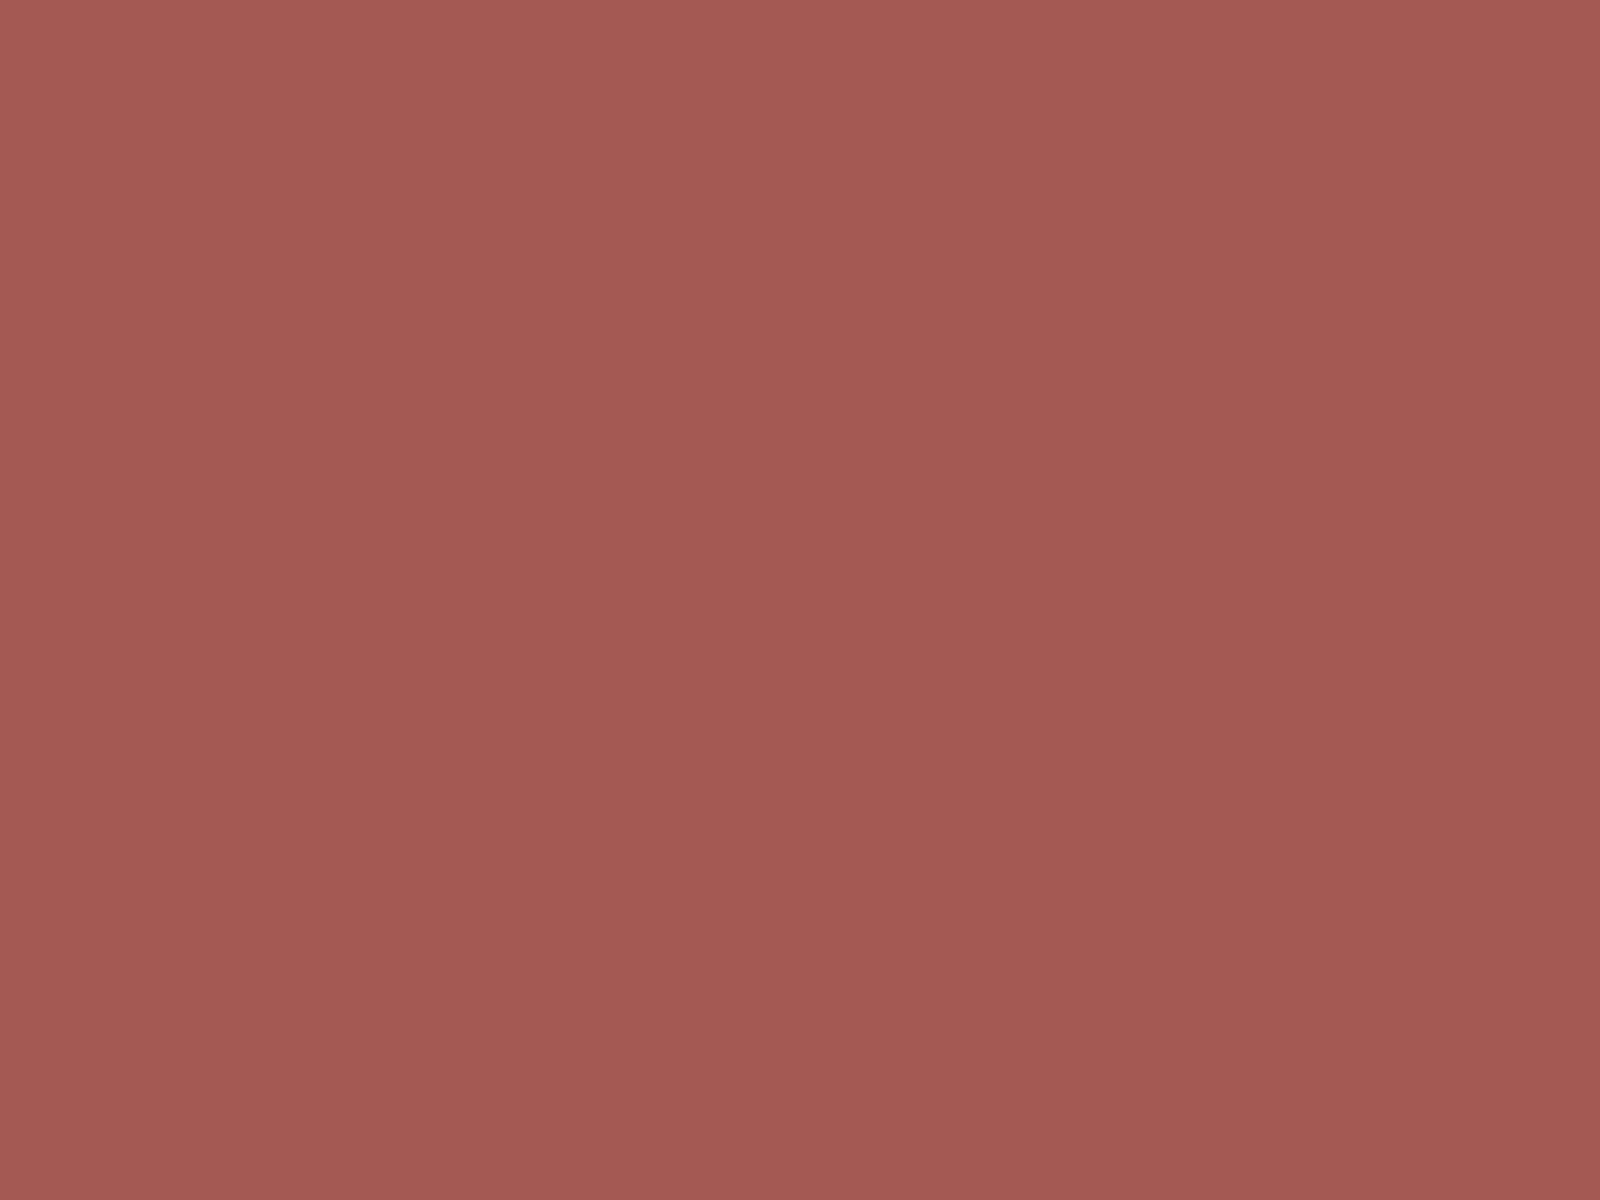 1600x1200 Redwood Solid Color Background